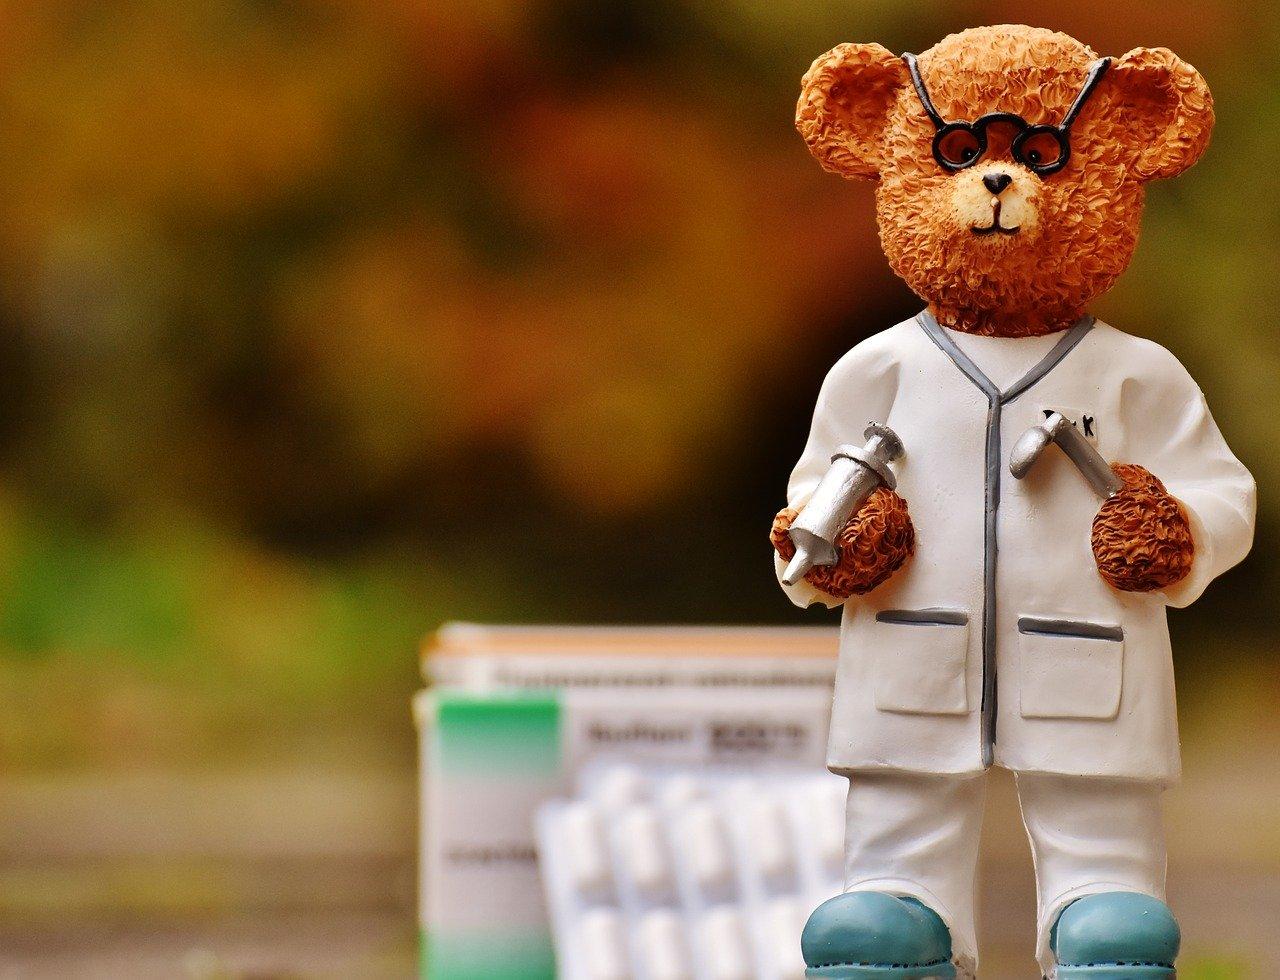 orsetto peluche medico pixabay